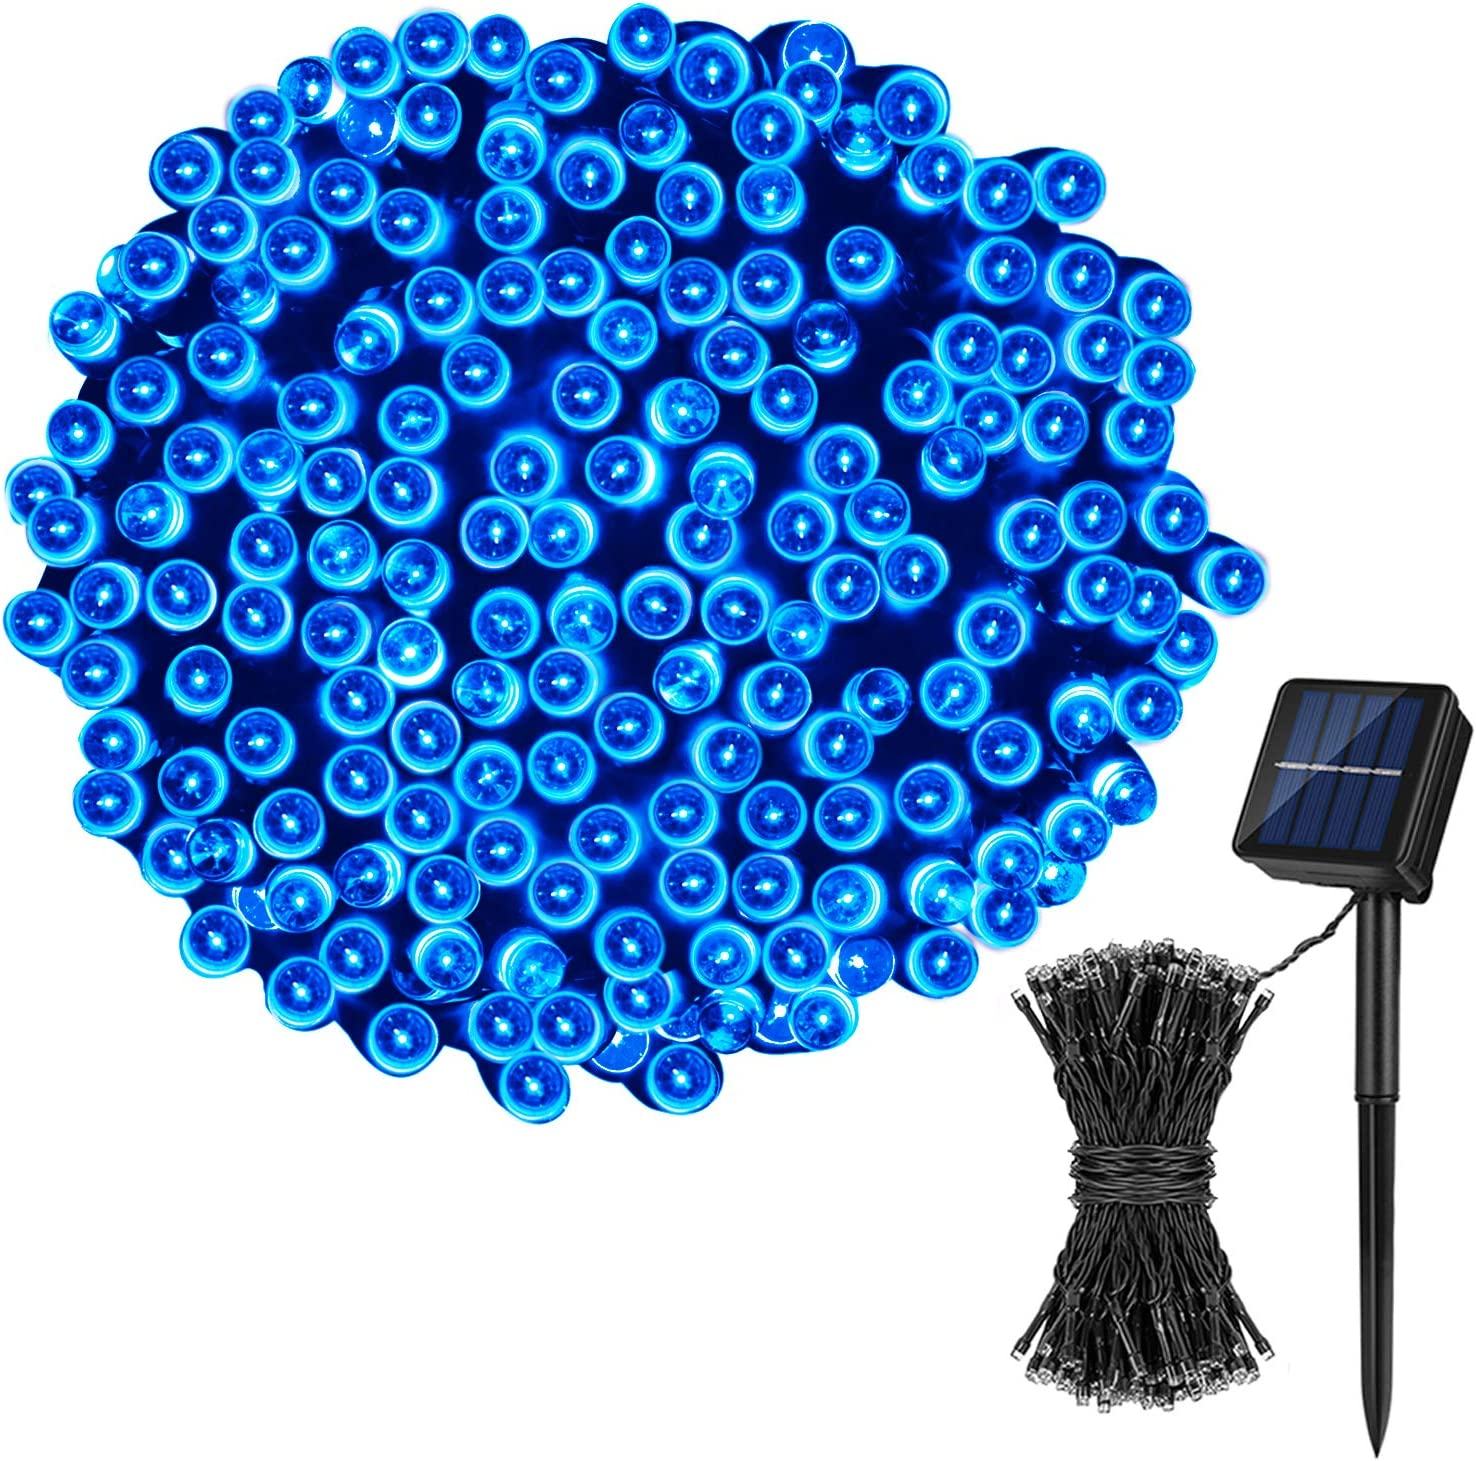 2X LED Solar Power Fairy Lights 12M String Outdoor Party Wedding Xmas Blue light